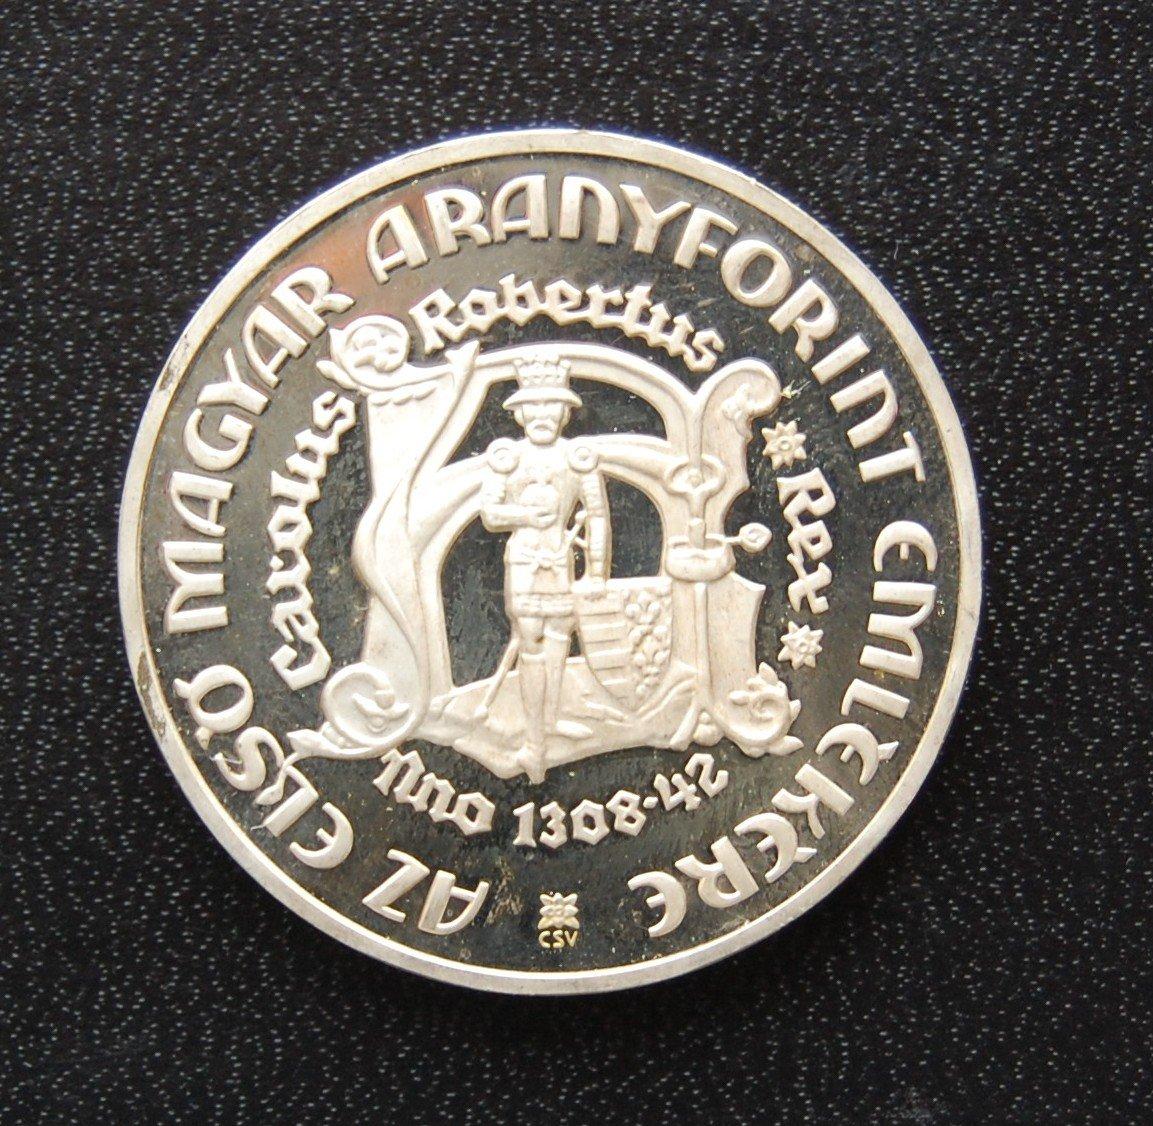 1978 200 forint proof Hungary